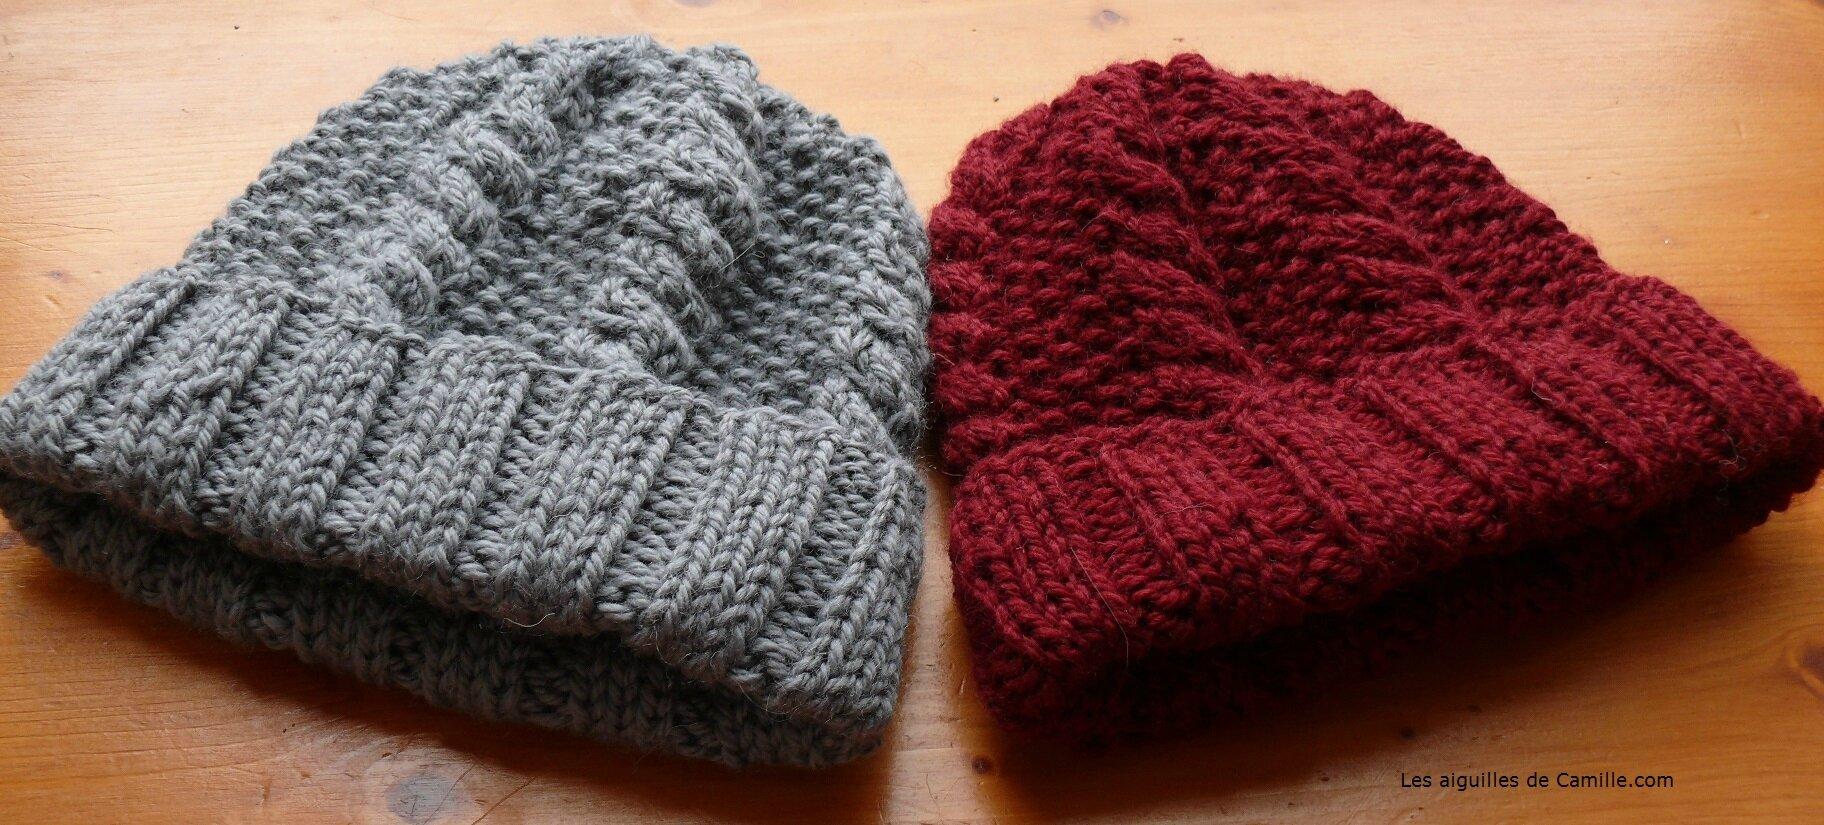 c3e52a95a107 Favori Swallowfield  un bonnet pour toute la famille.